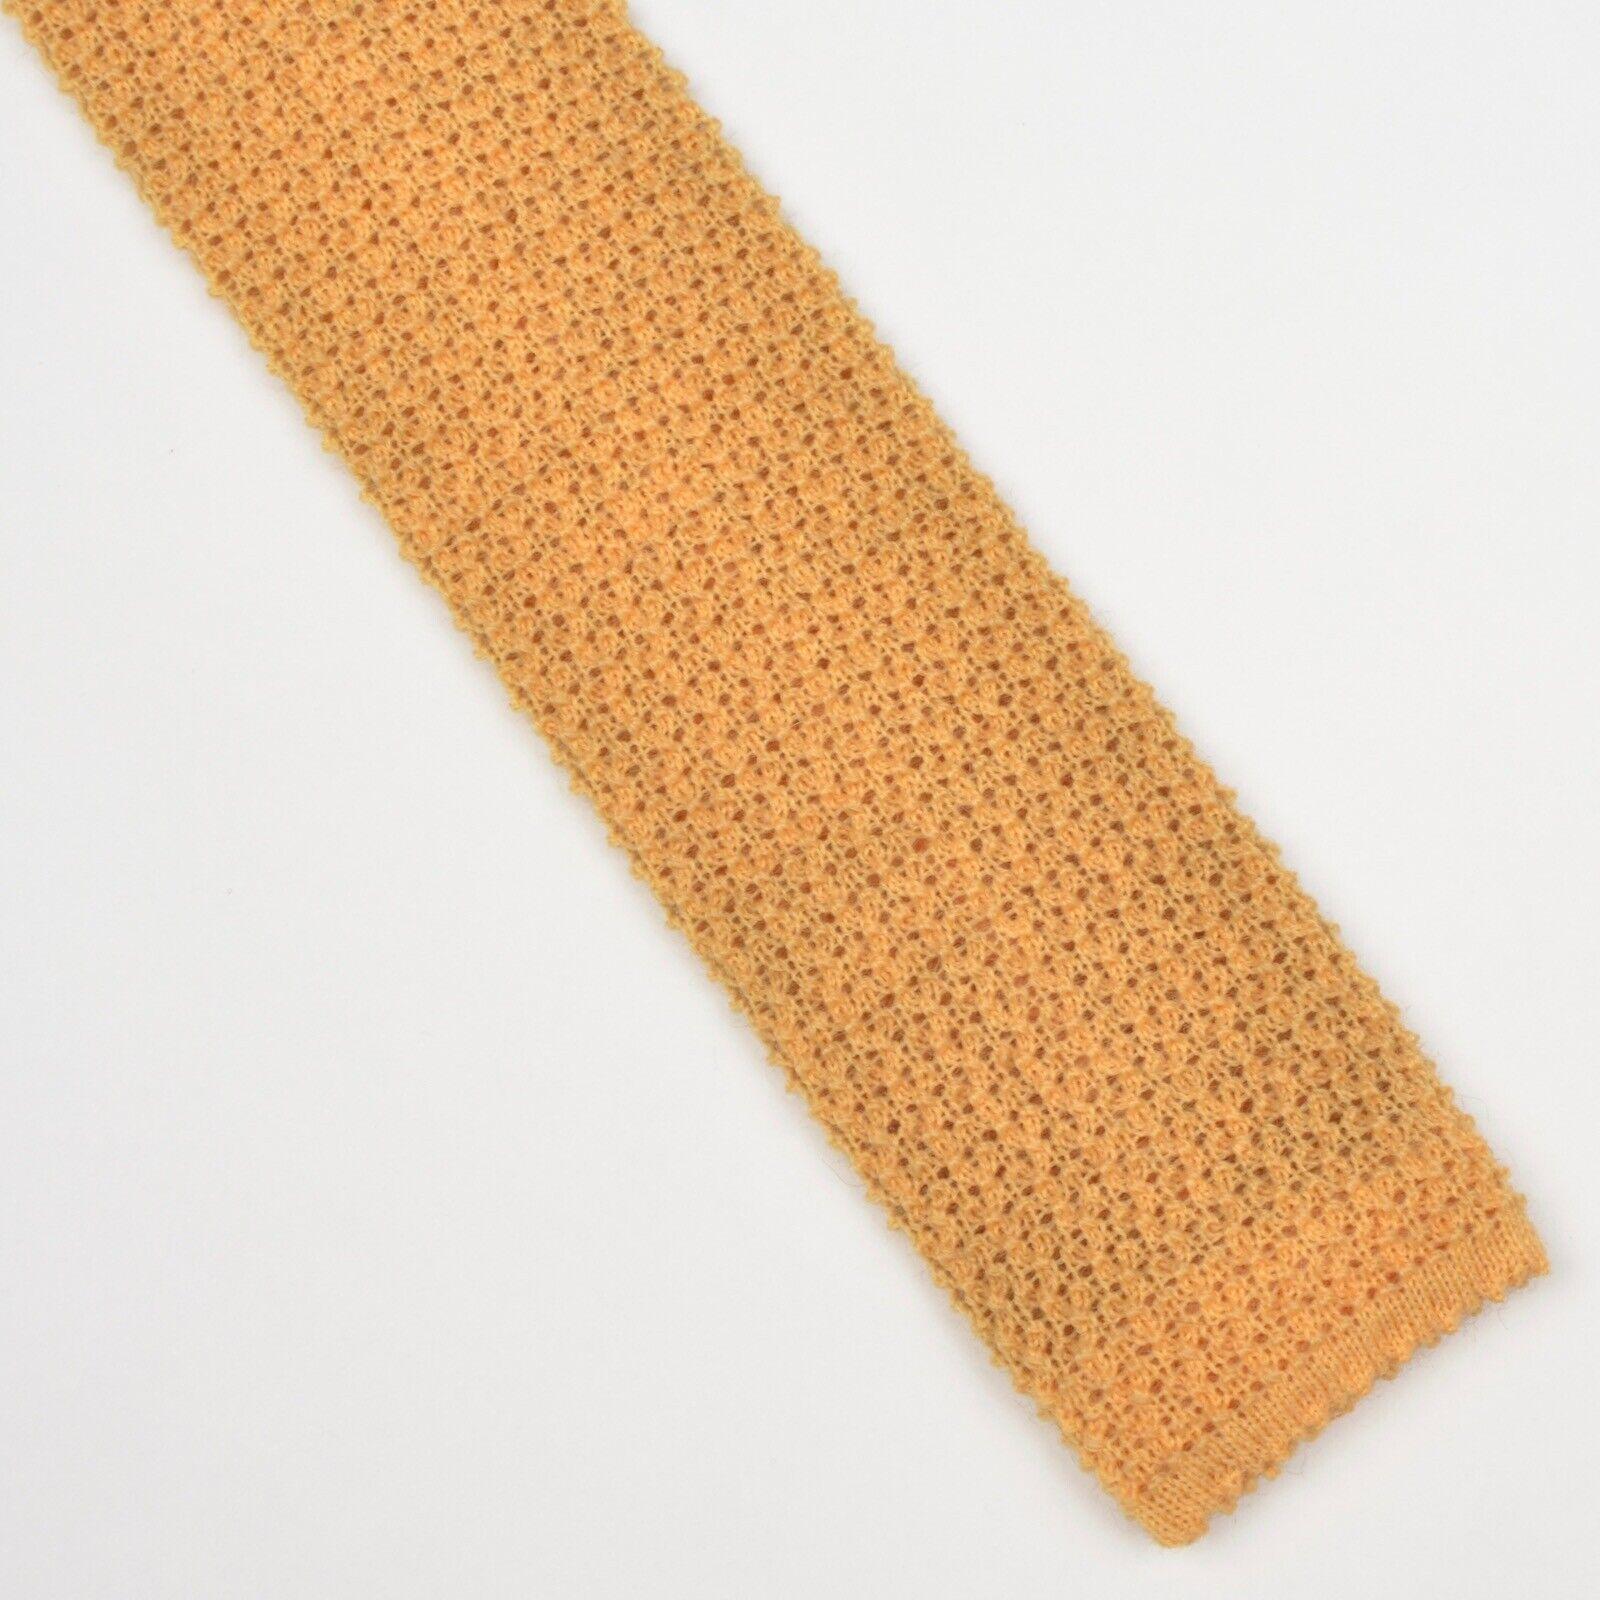 100% Wolle Wool Gestrickte Krawatte Knit Tie Gelb Yellow HERBST Made in Italy